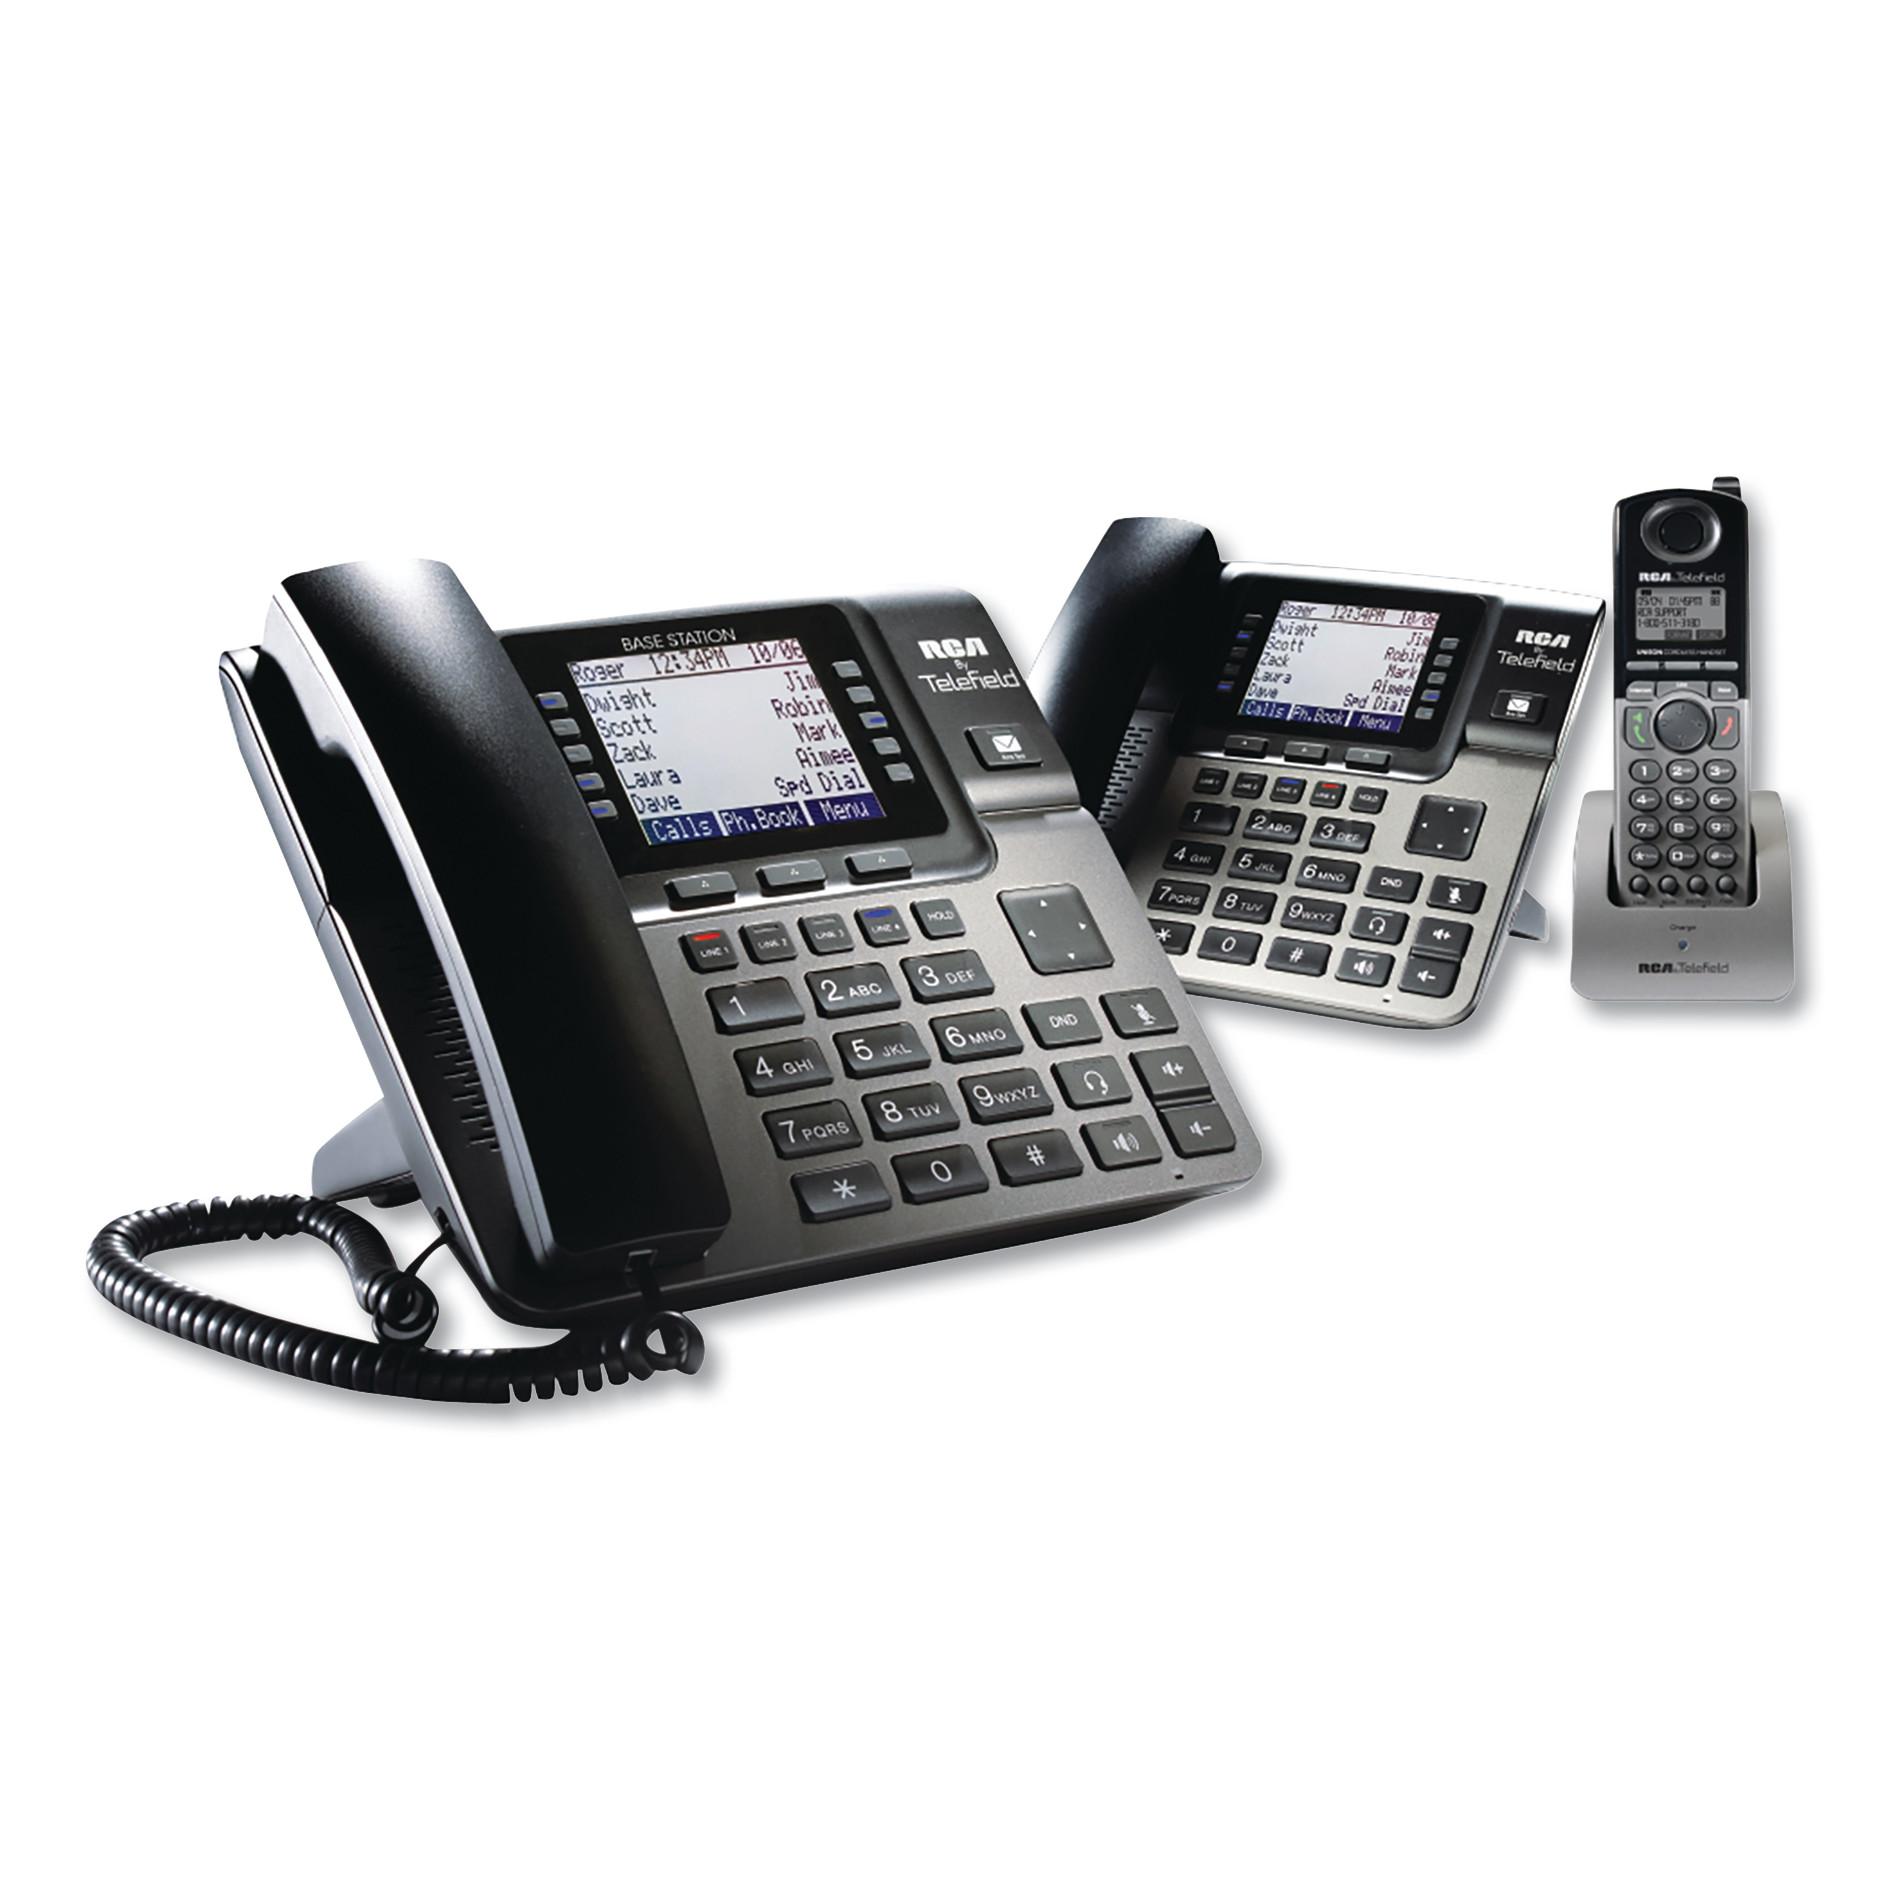 Unison 1-4 Line Wireless Phone System Bundle, w/ 1 Deskphone, 1 Cordless Handset